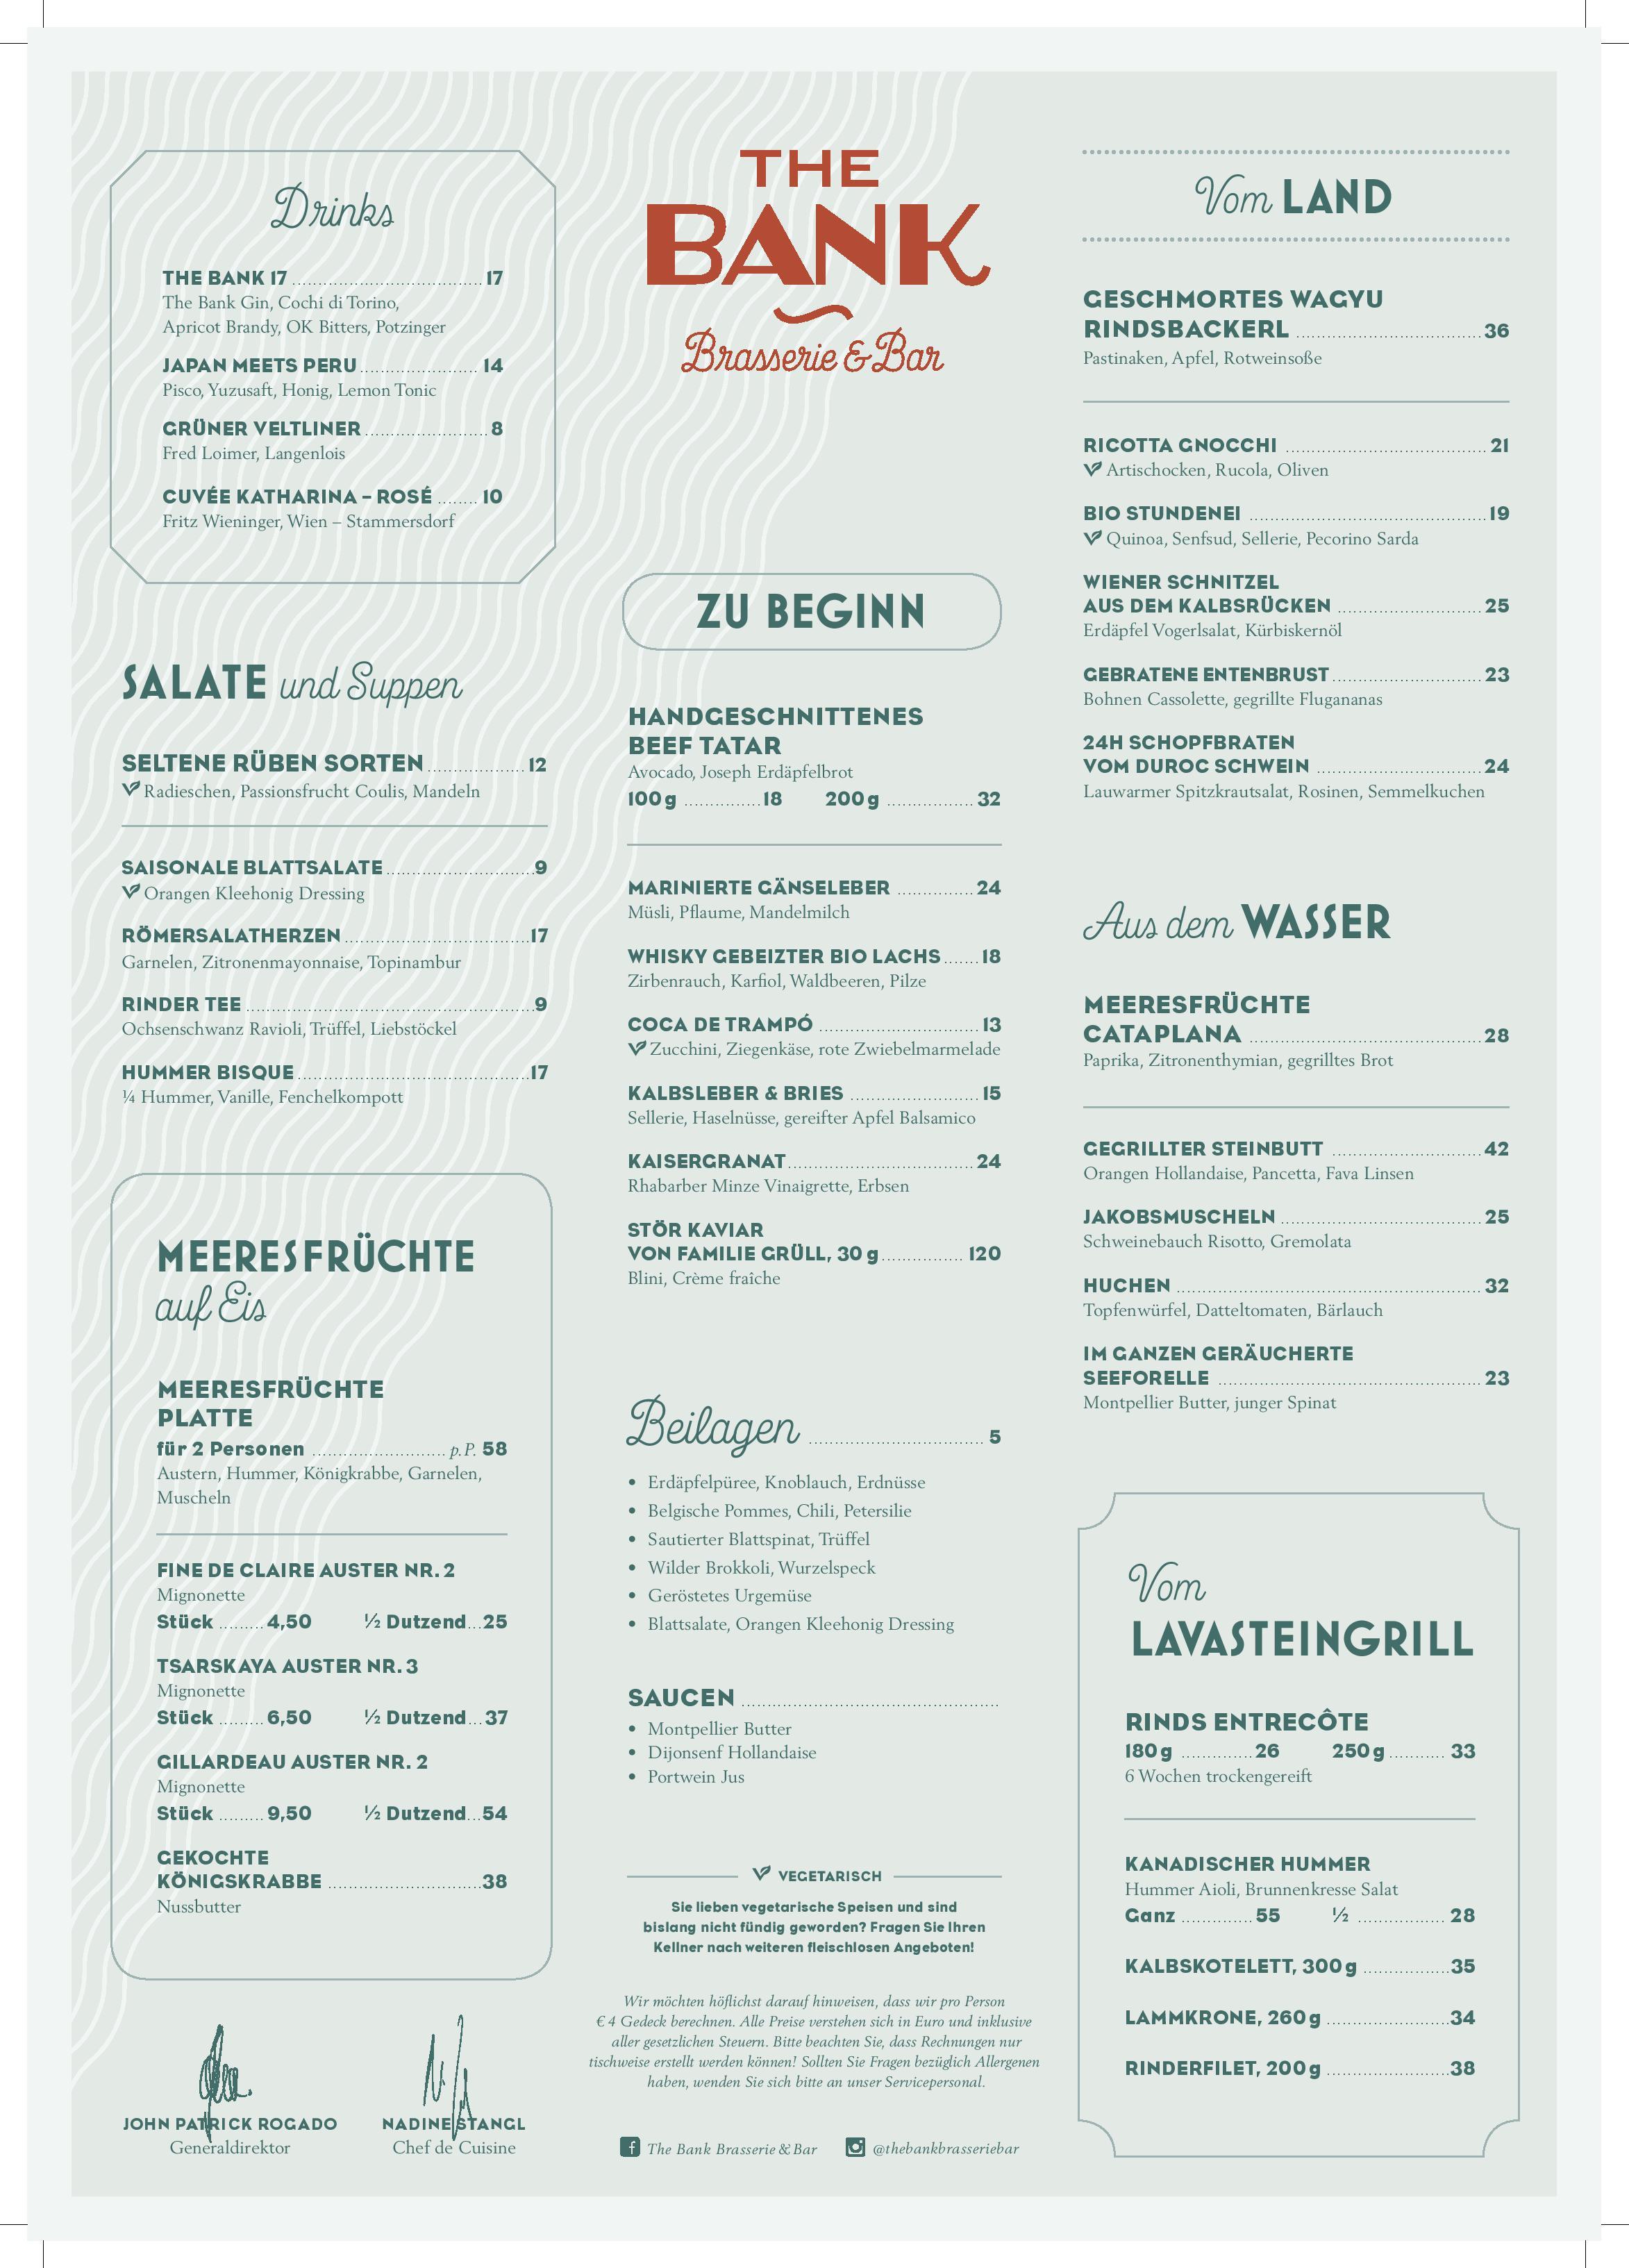 Speisekarte - Restaurant The Bank Brasserie Bar in Wien